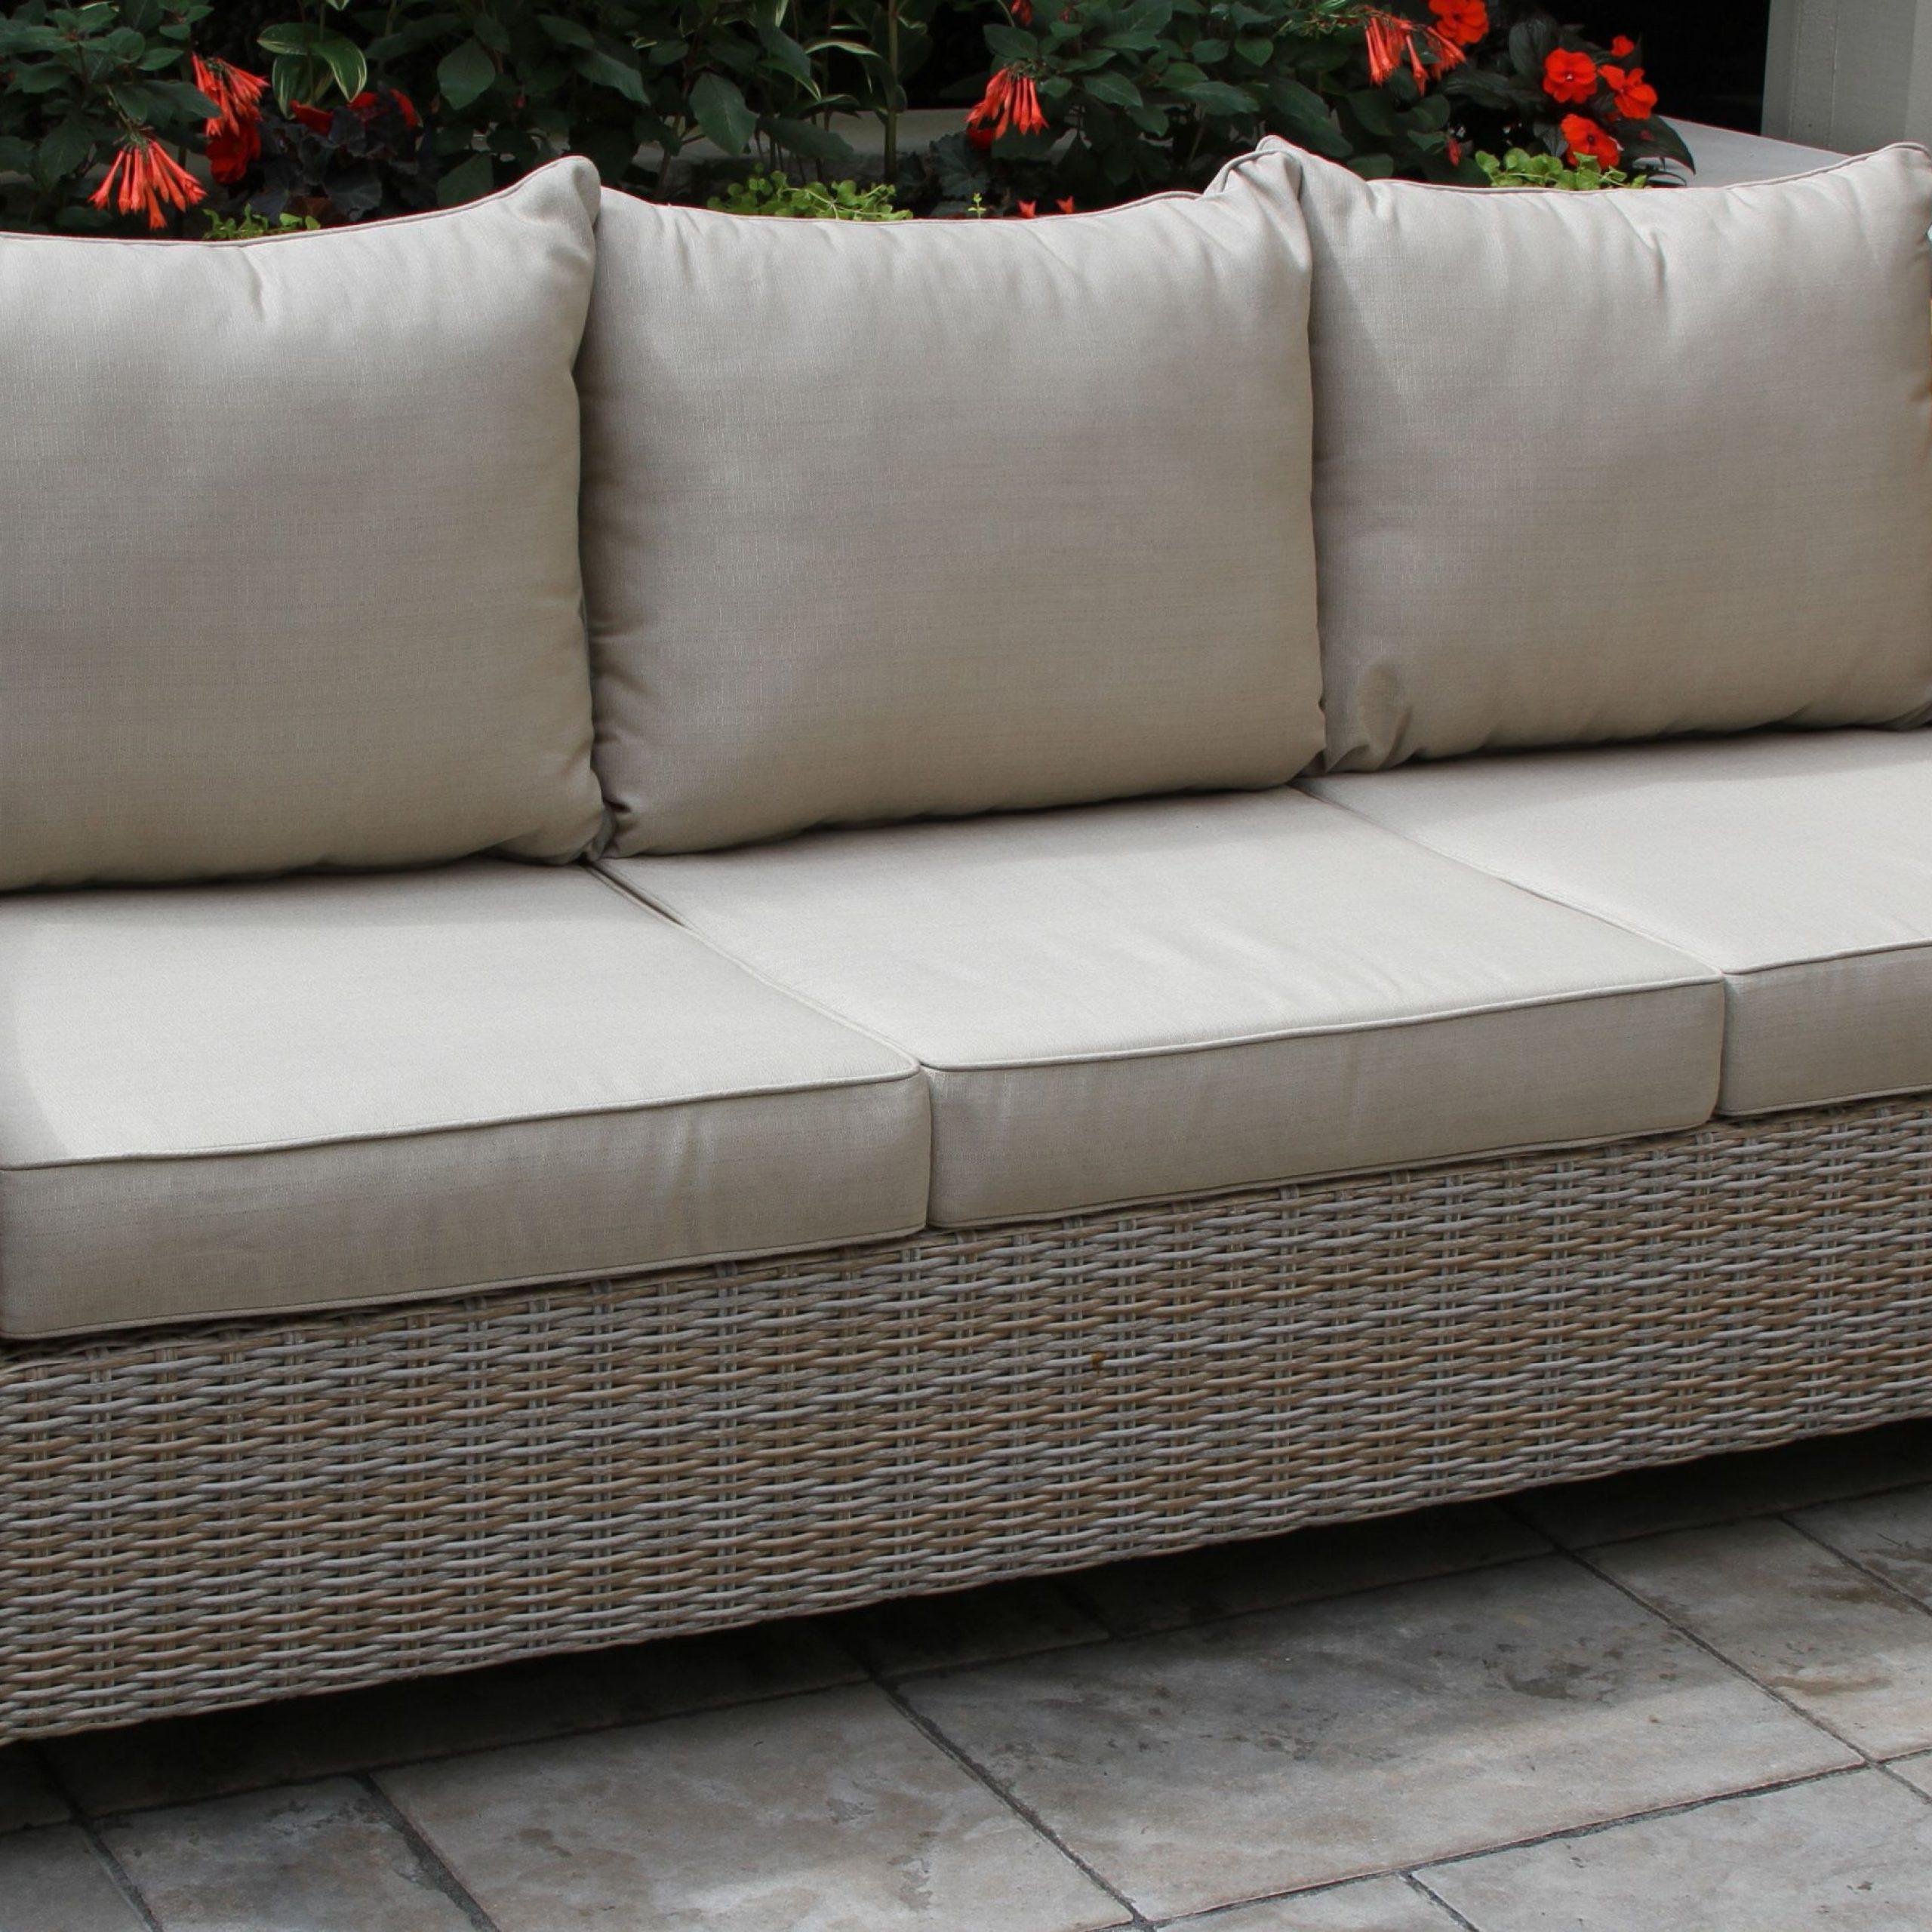 Well Liked Vineyard Teak & Wicker Sofa With Sunbrella Cushions With Regard To Kincaid Teak Patio Sofas With Sunbrella Cushions (View 6 of 25)